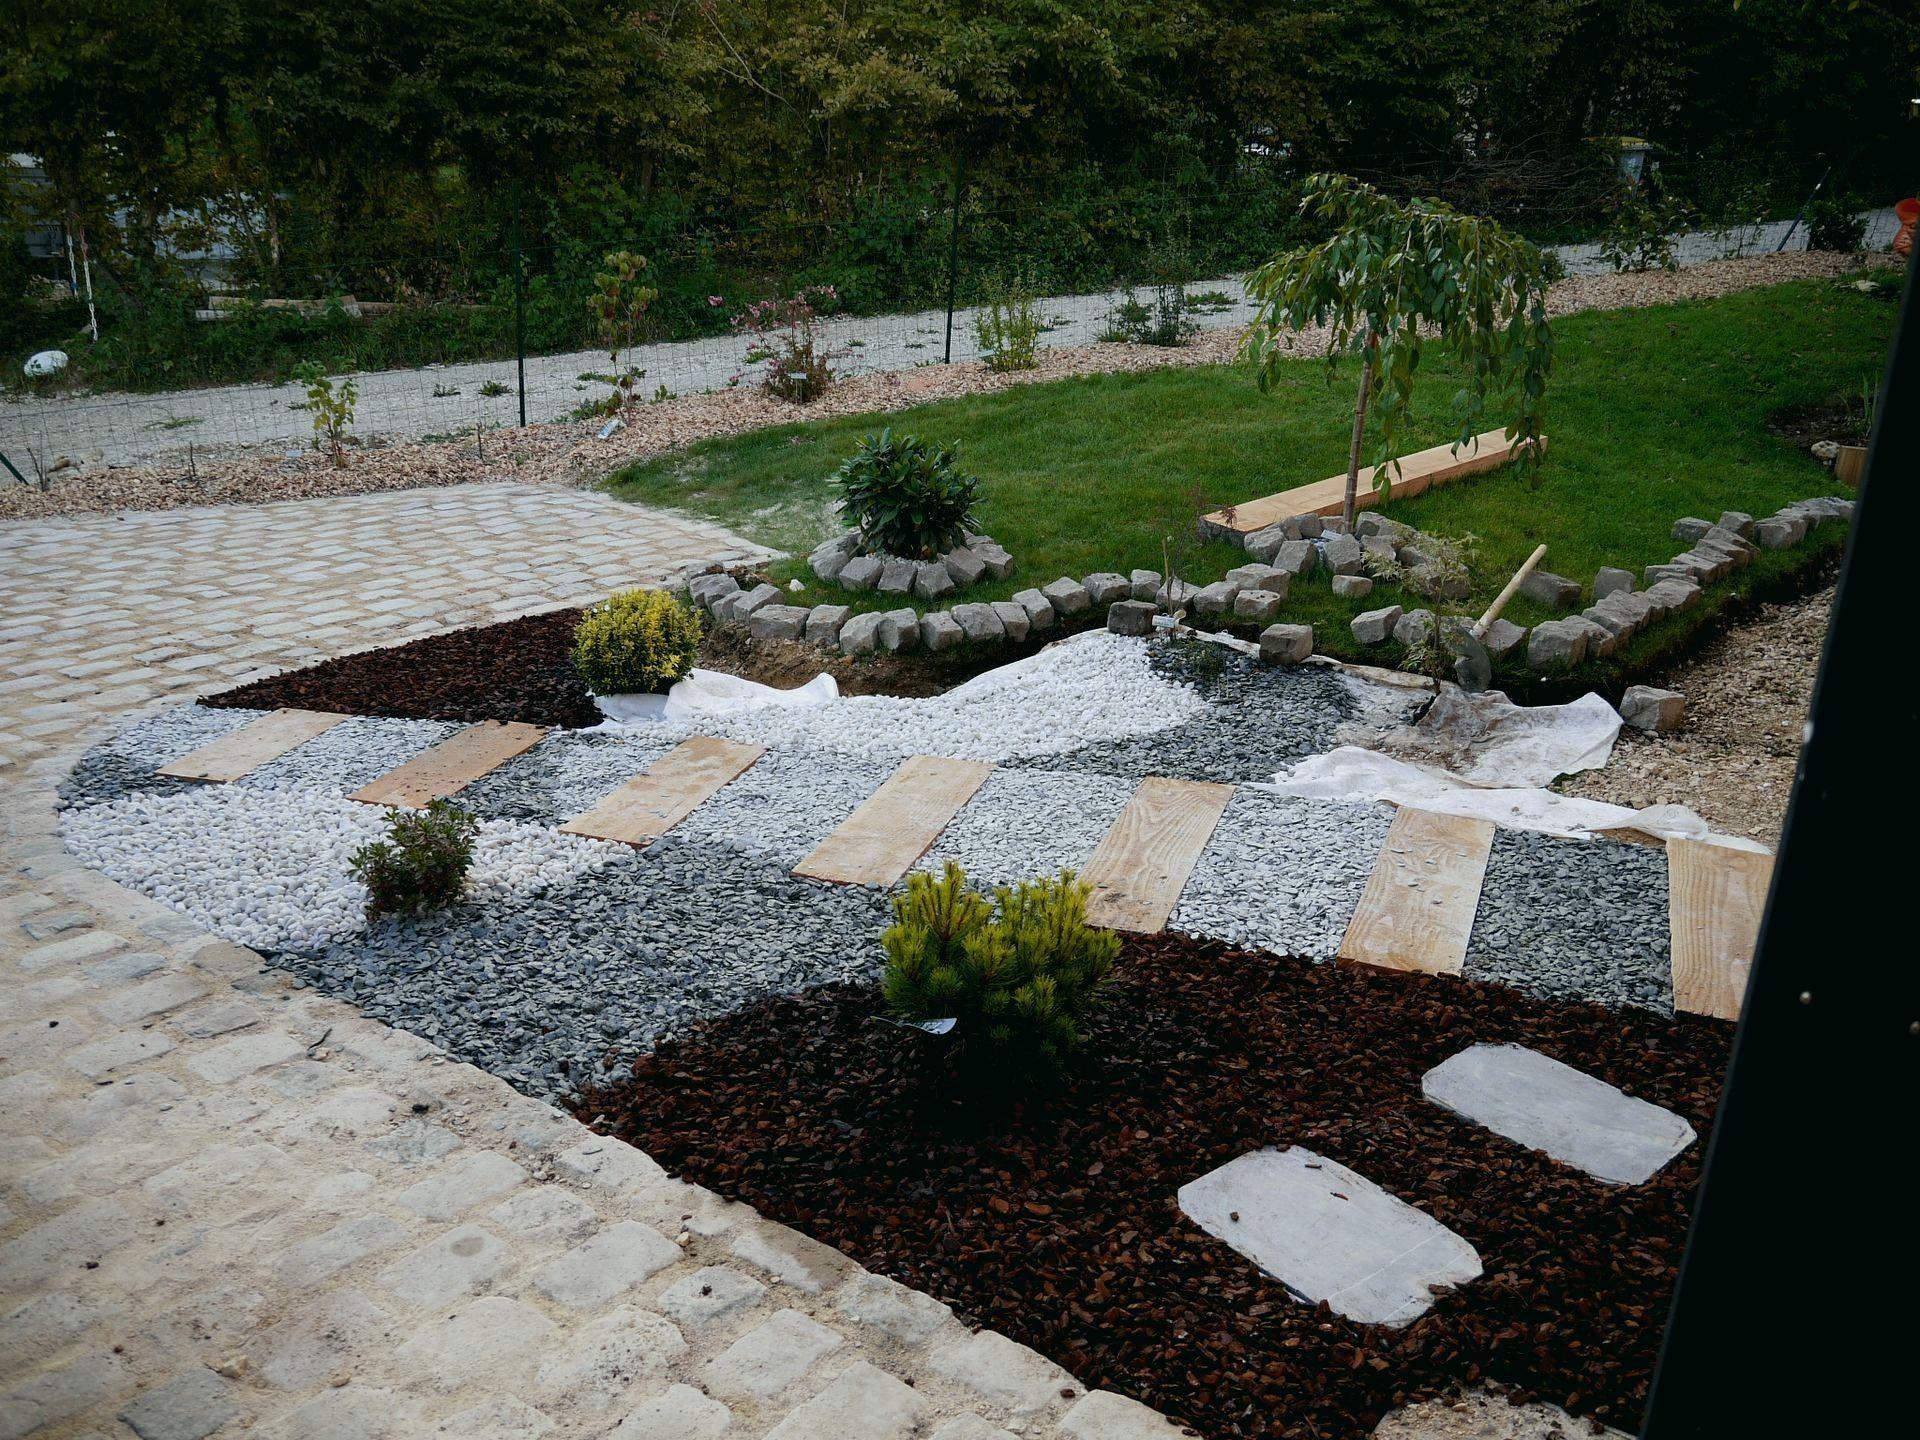 All E De Jardin Pas Cher Design De Maison Bordure Alle ... tout Bordures De Jardin Pas Cher